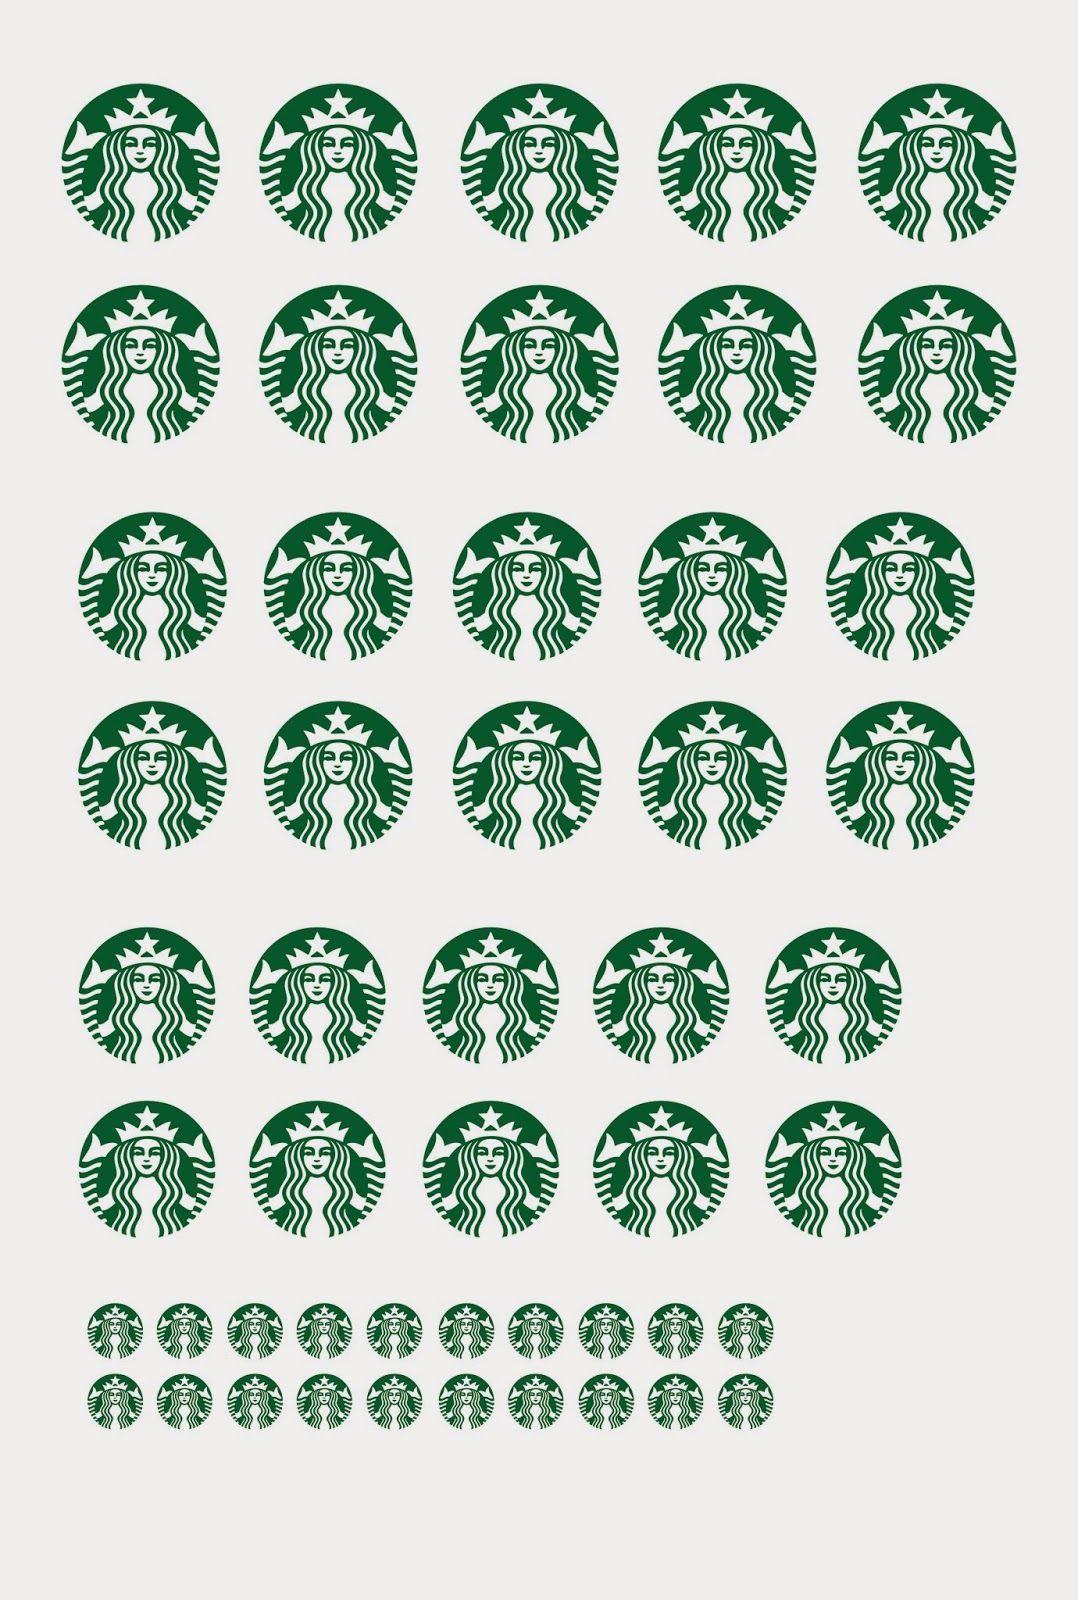 picture about Starbucks Logo Printable named Medium Printable Starbucks Symbol - LogoDix